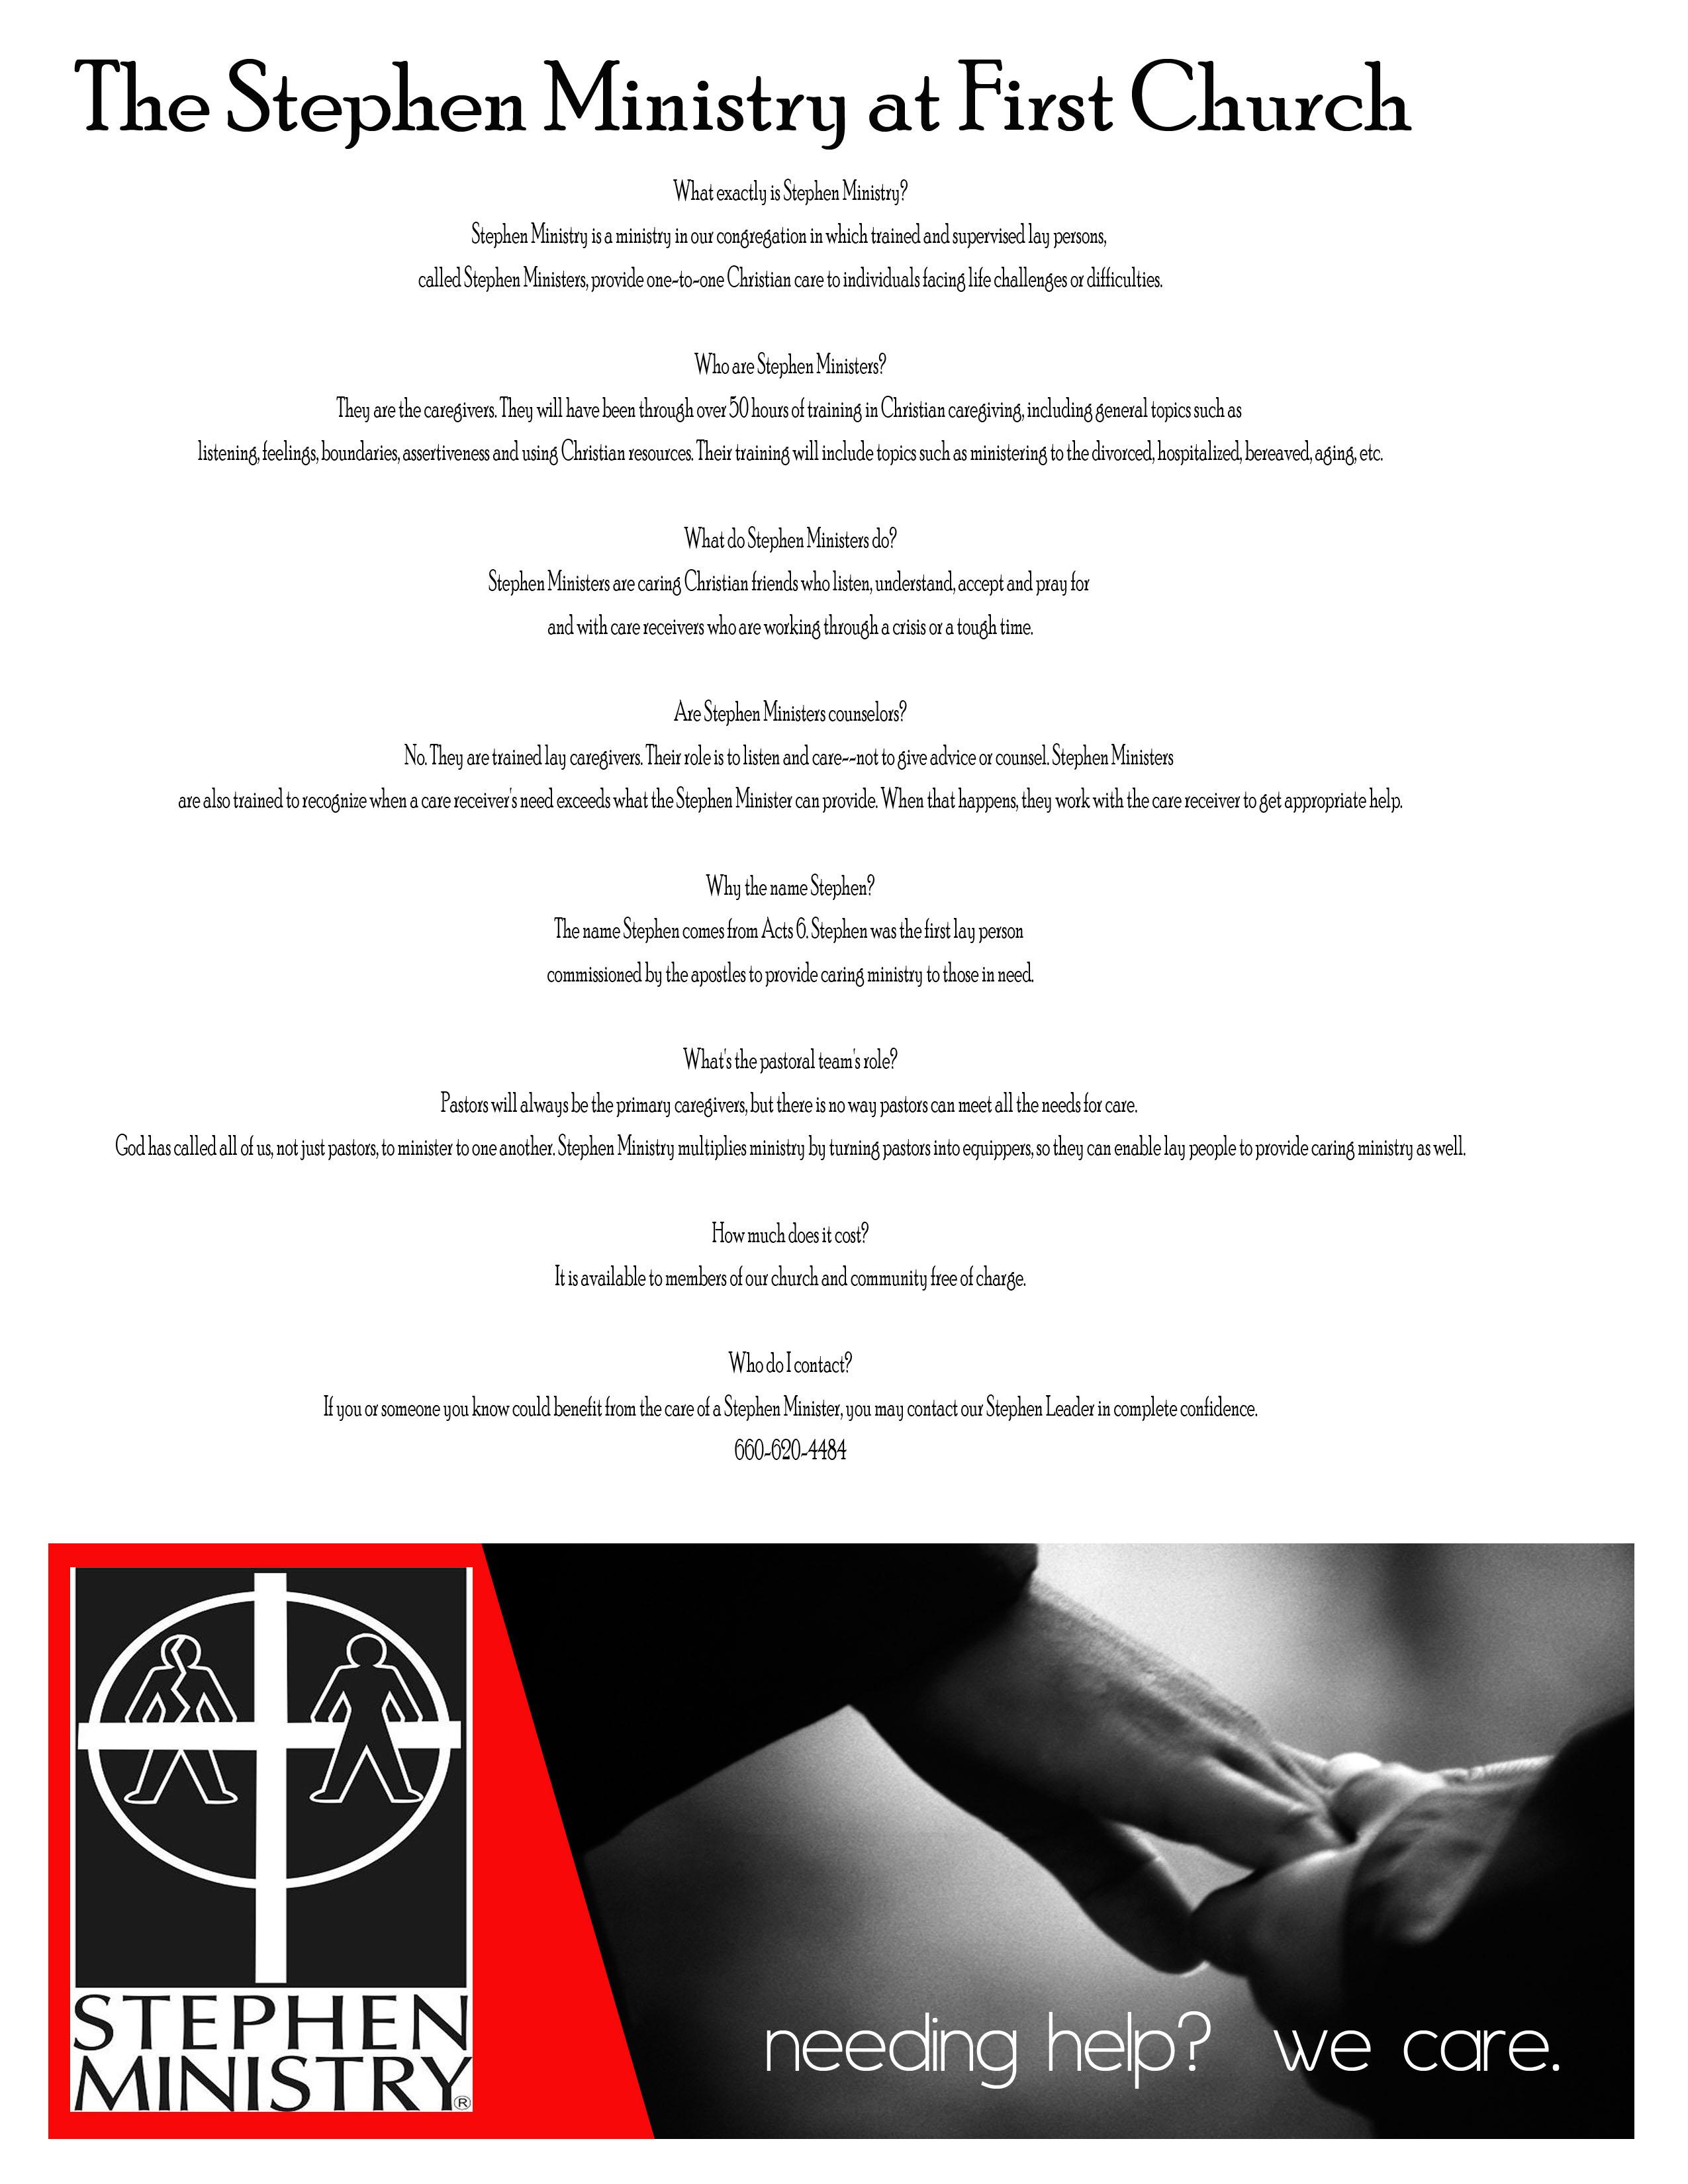 first united methodist church   //Stephen Ministry